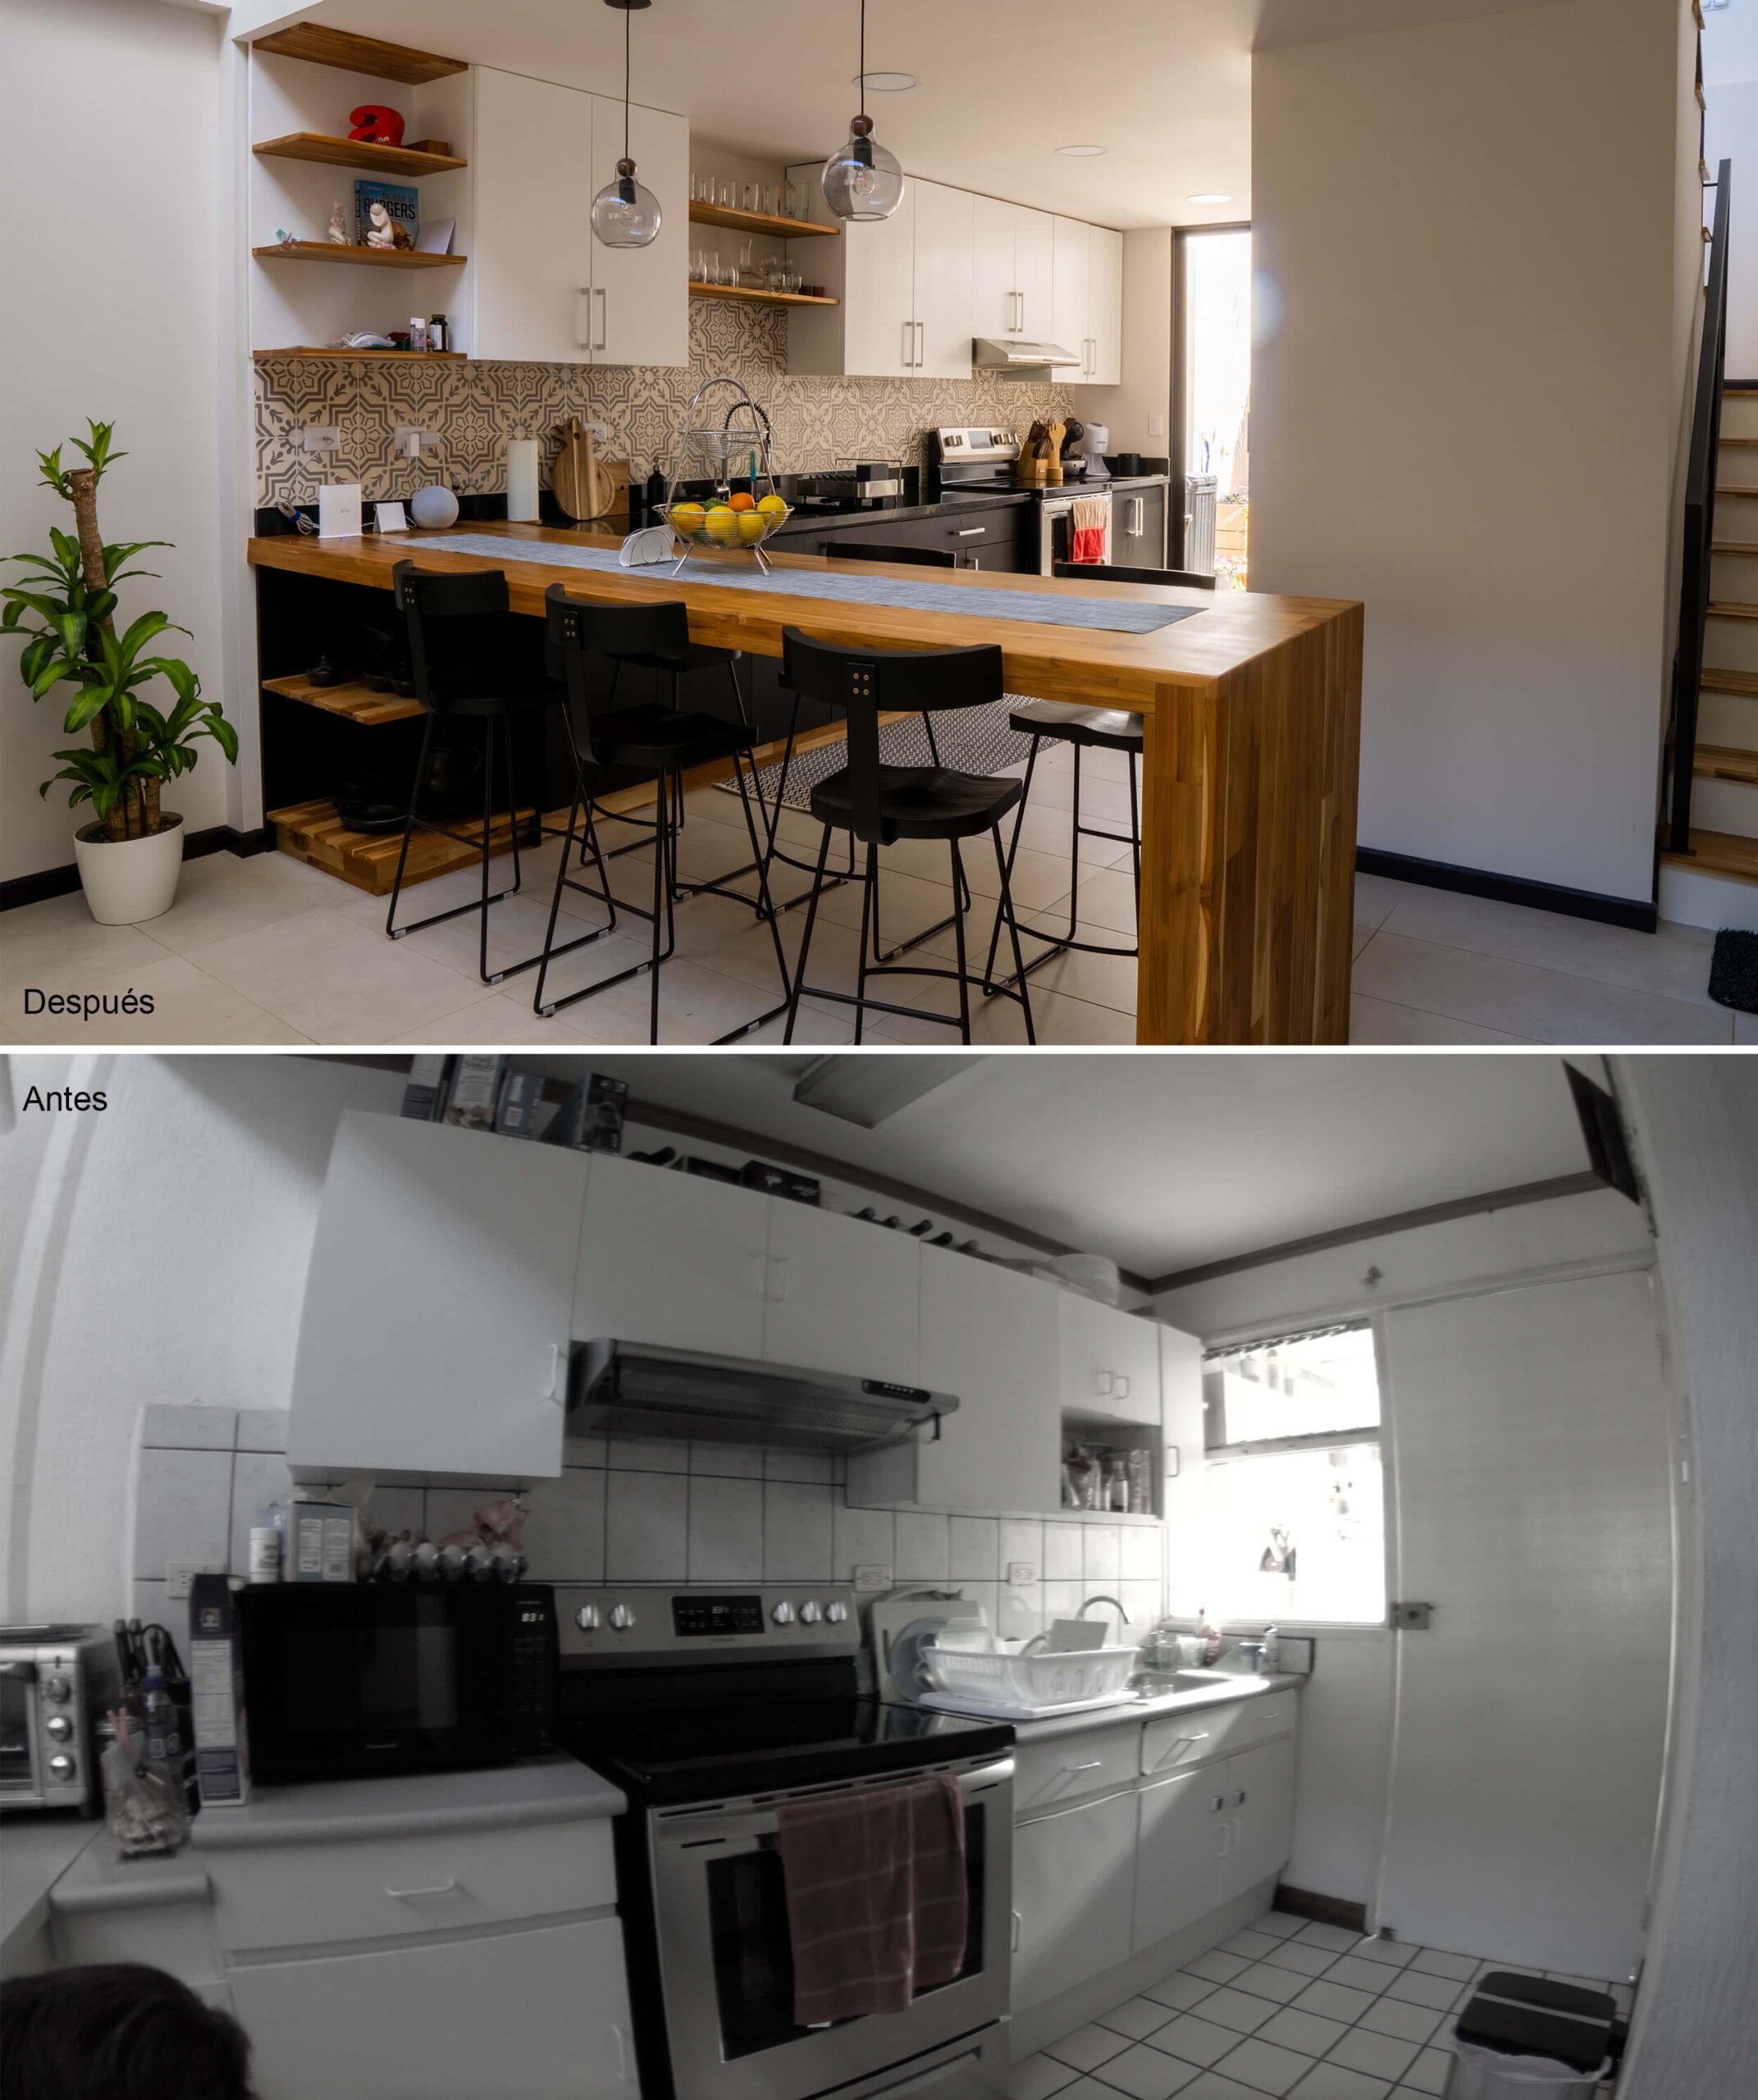 remodelar casa costa rica